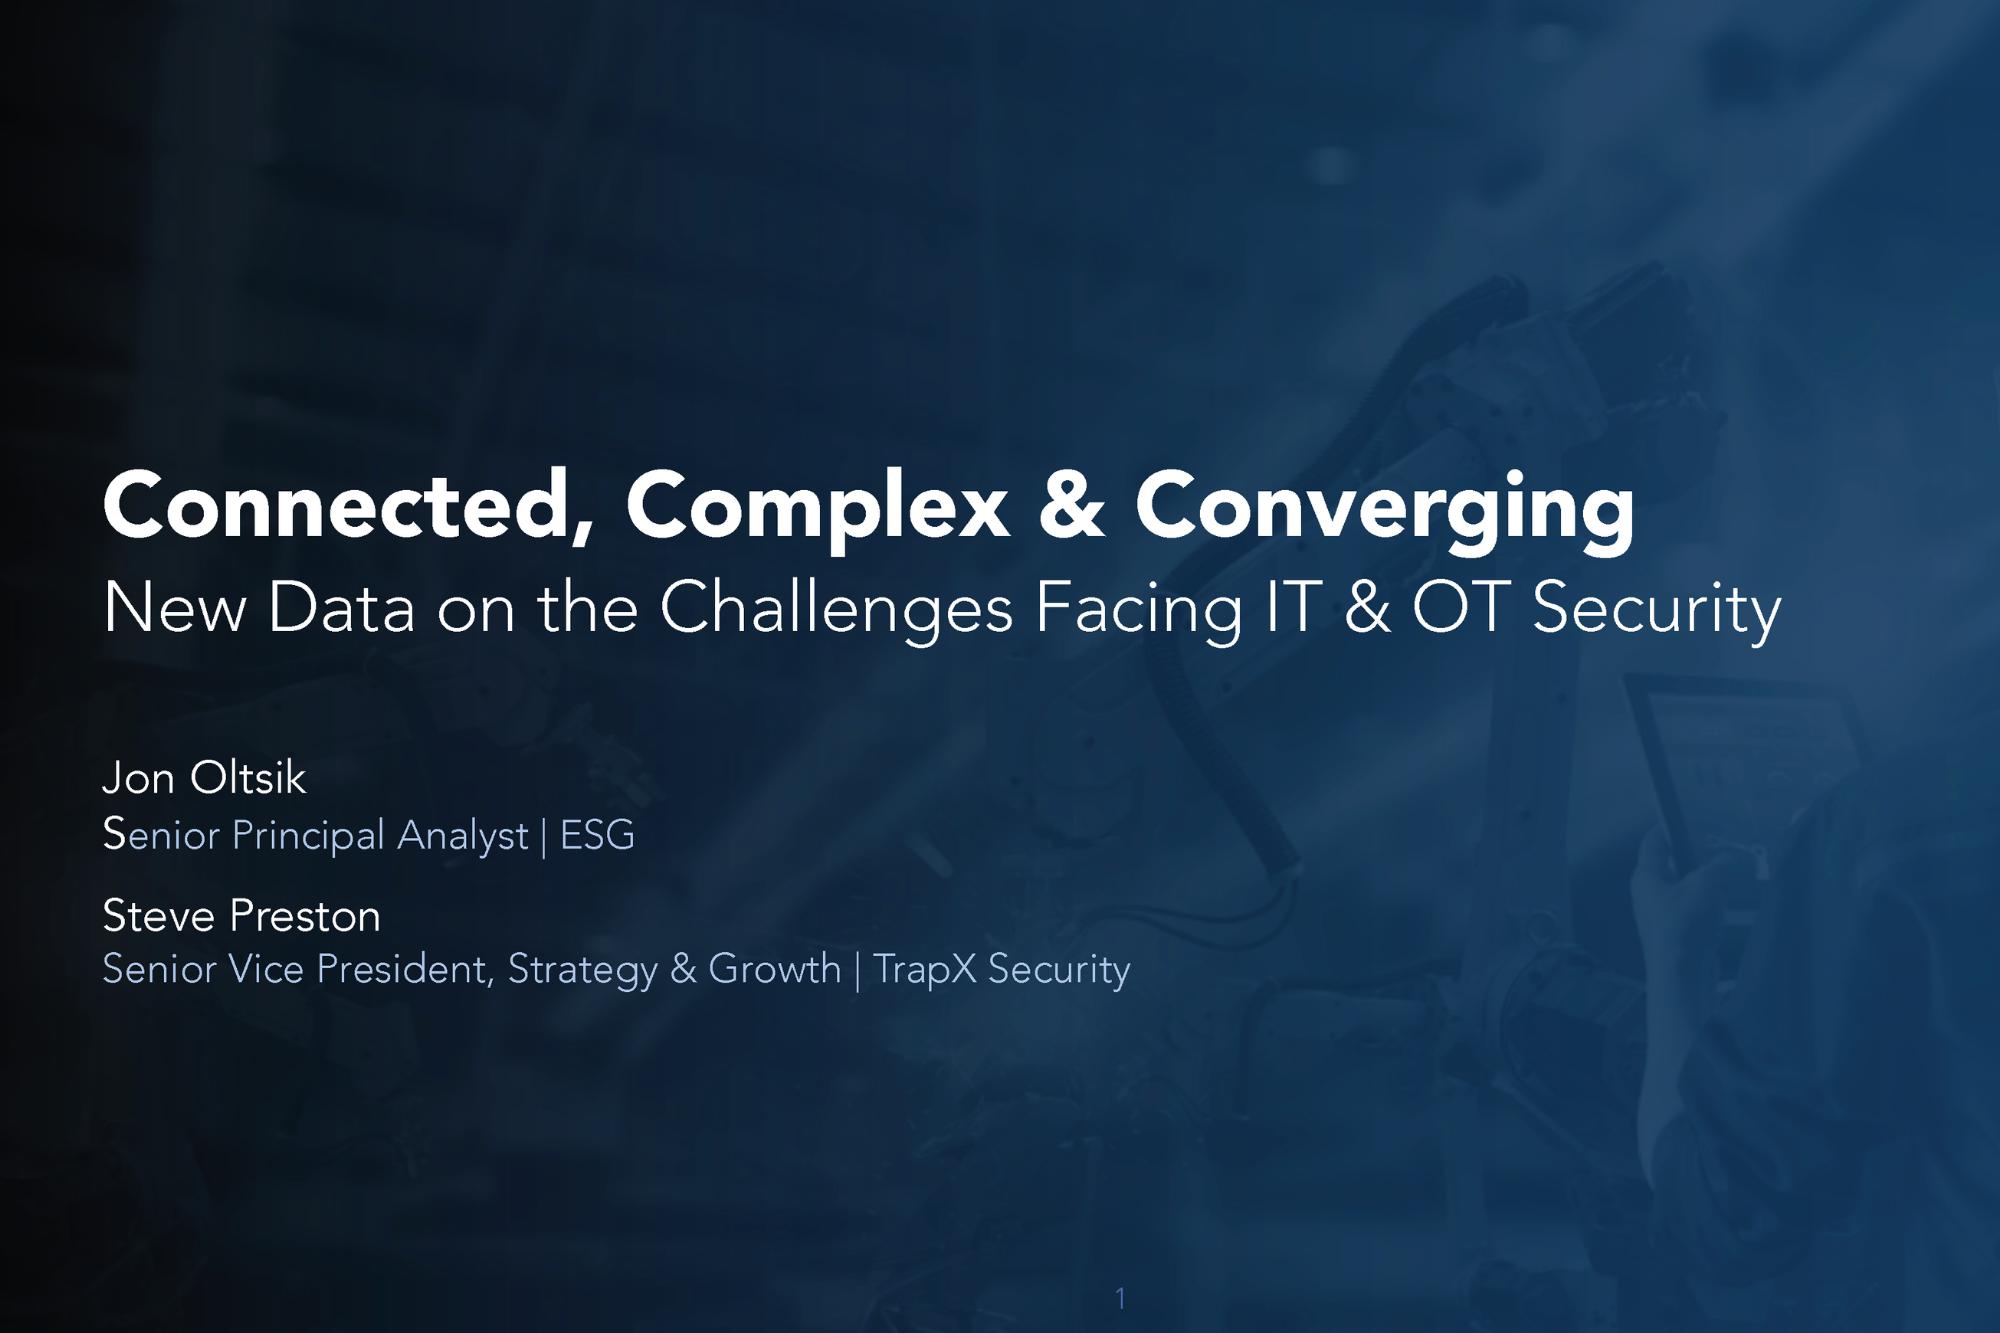 ESG October 2020 webinar slides thumbnail